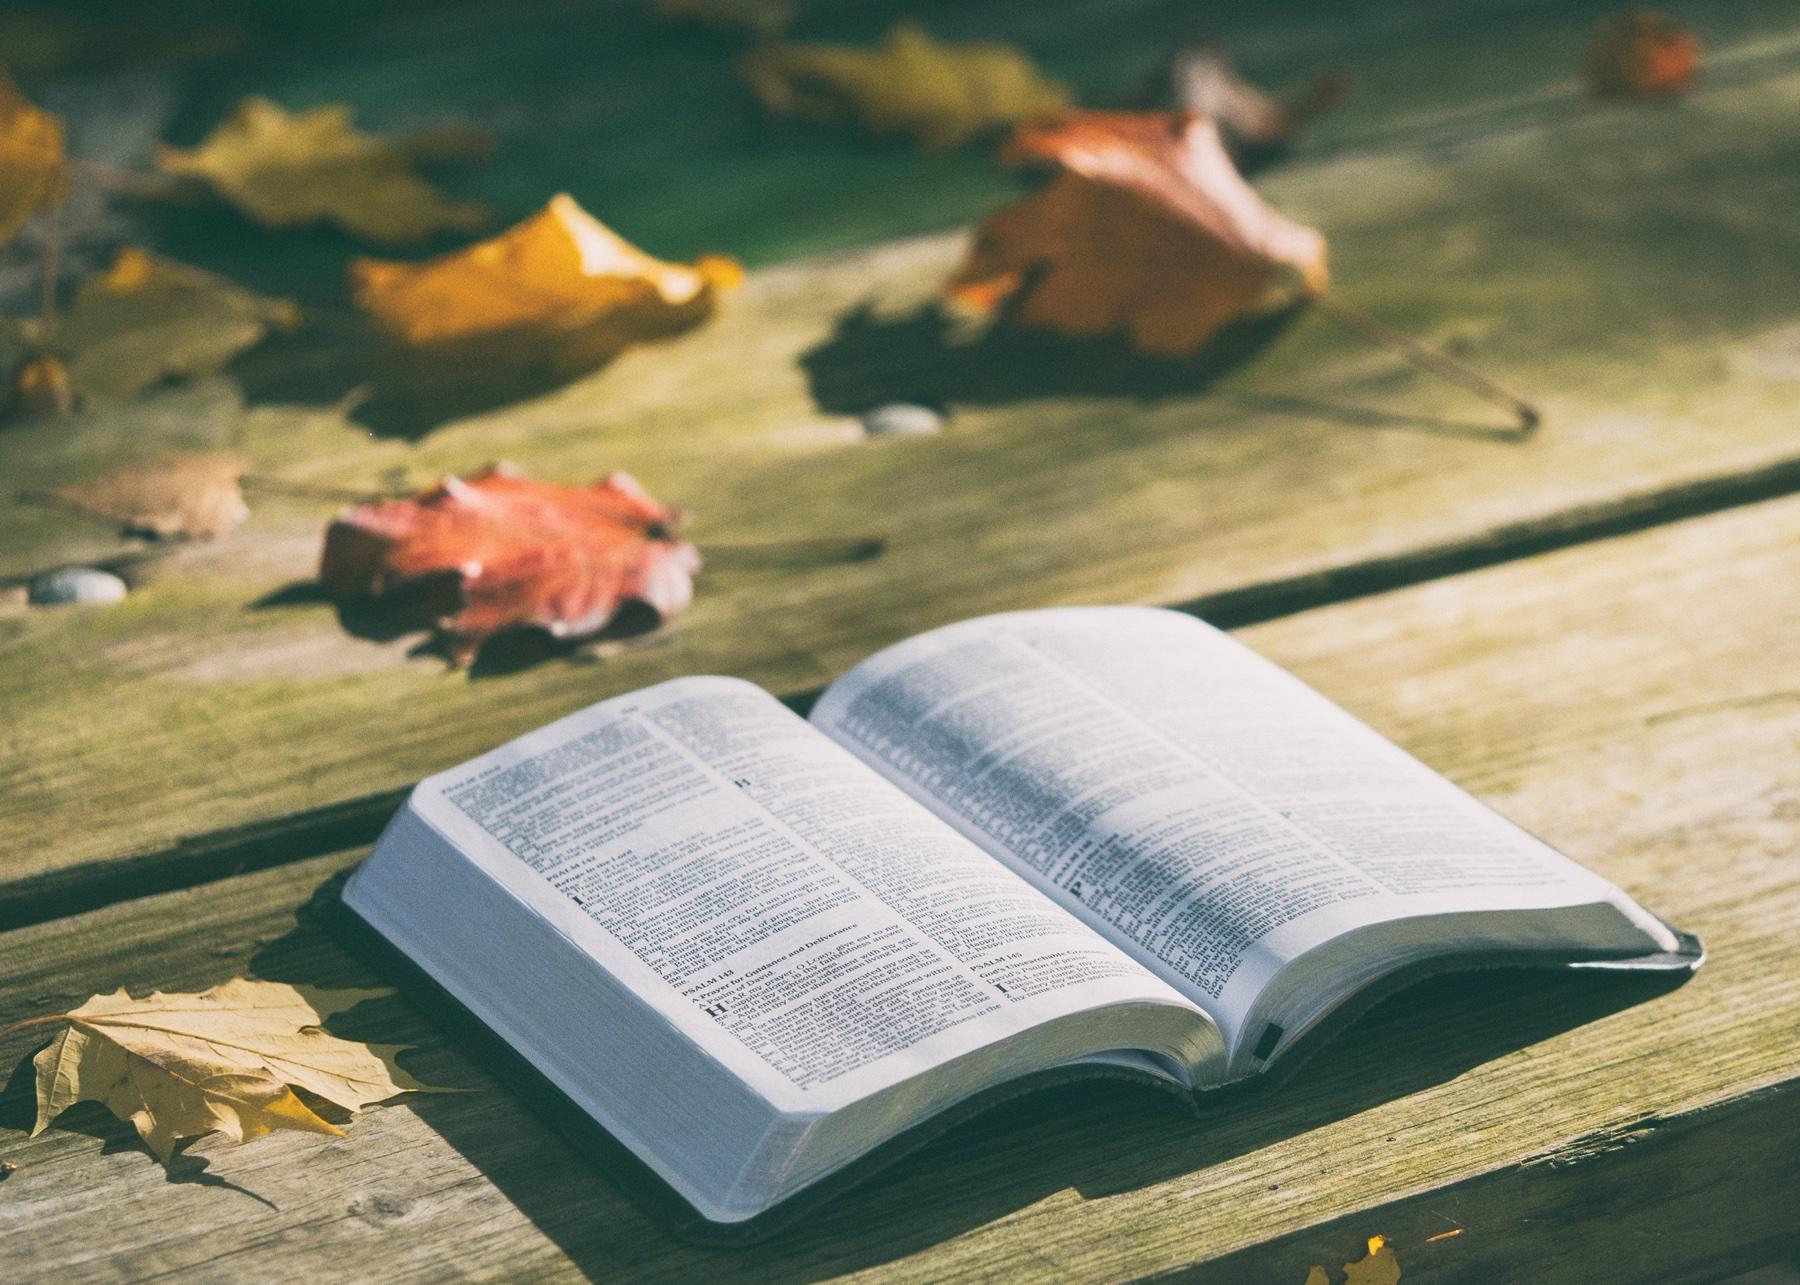 bible-1868070